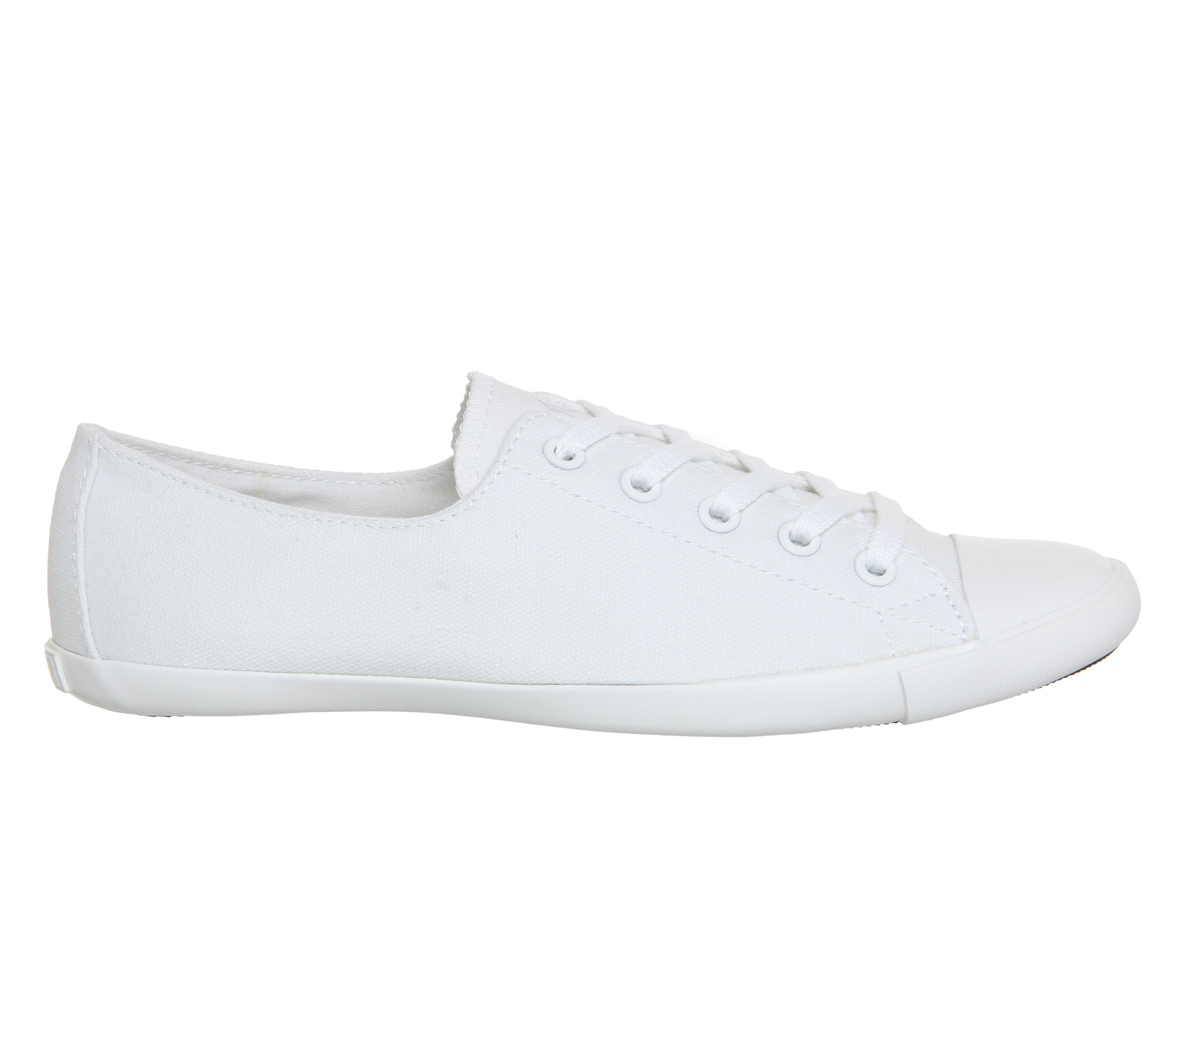 3f5dce6f5b2 Lyst - Converse Ct Lite Ox in White